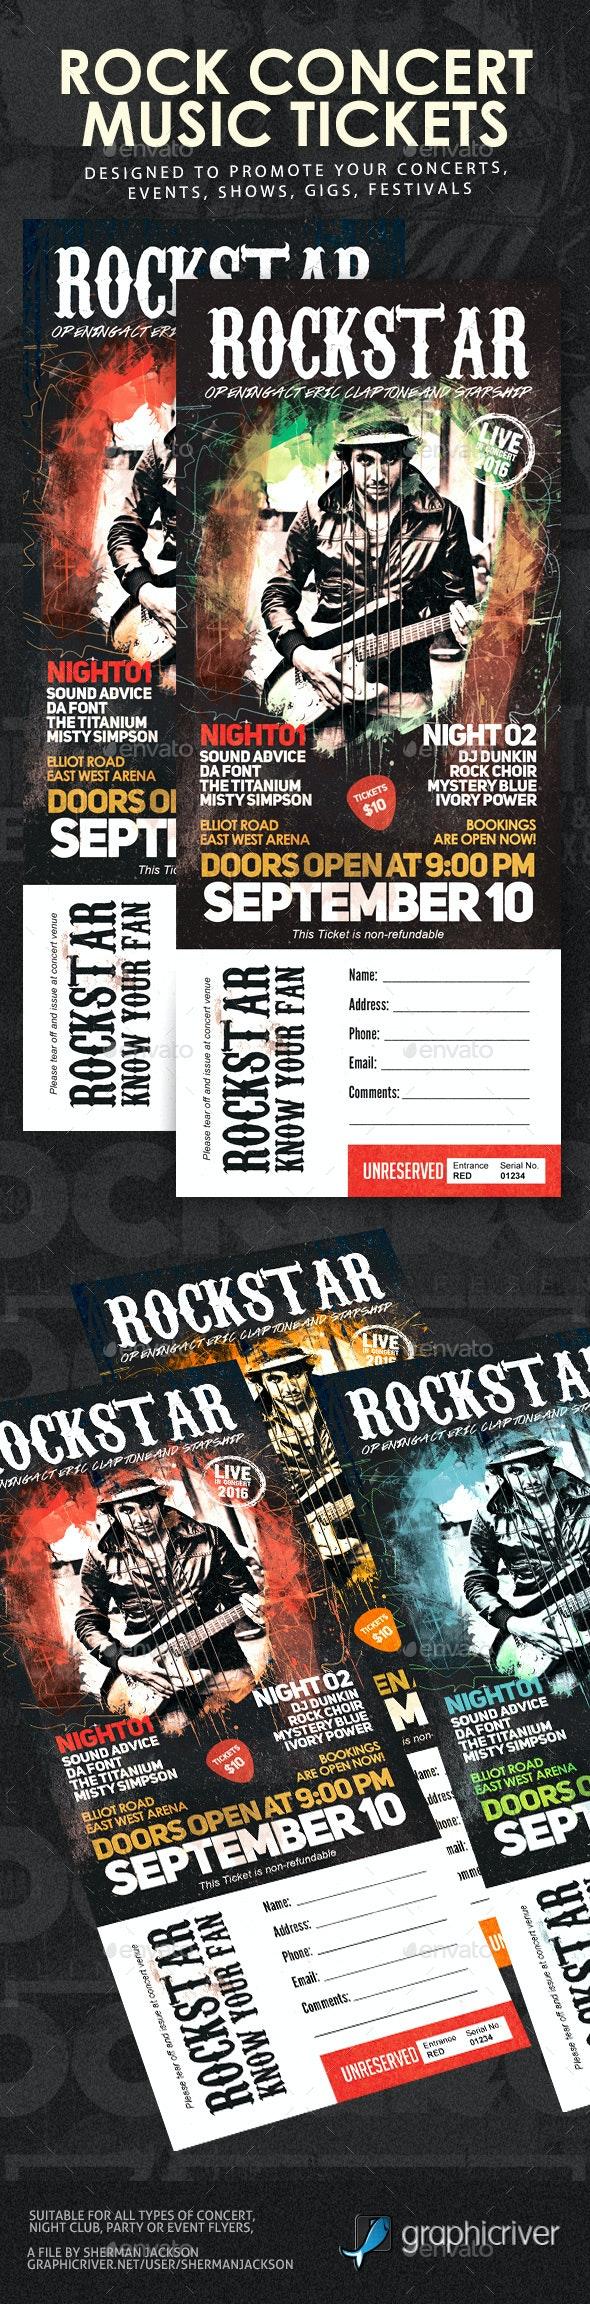 Rock Festival Concert Tickets - Miscellaneous Print Templates